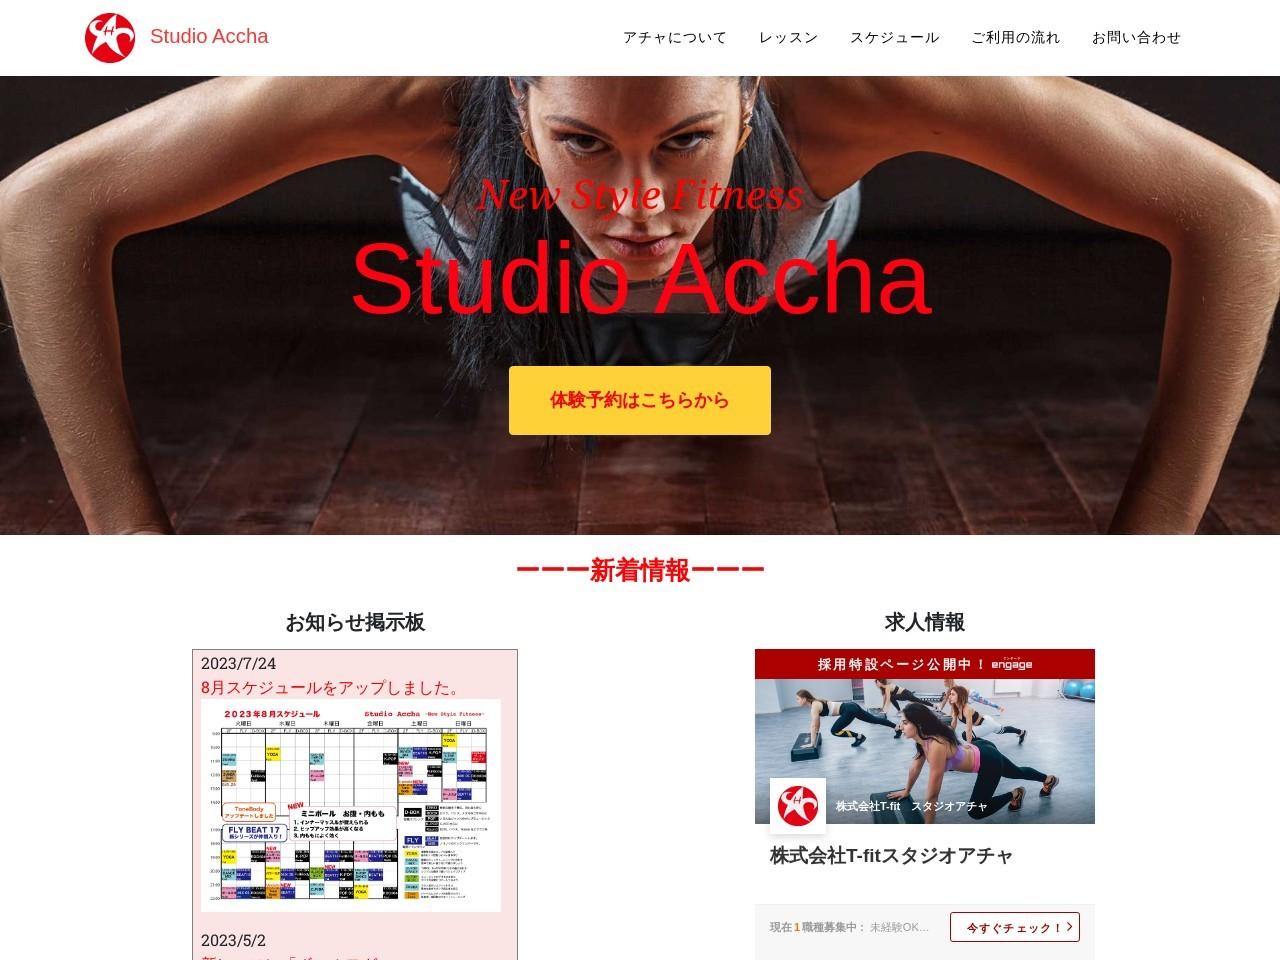 Studio Acchaのイメージ写真